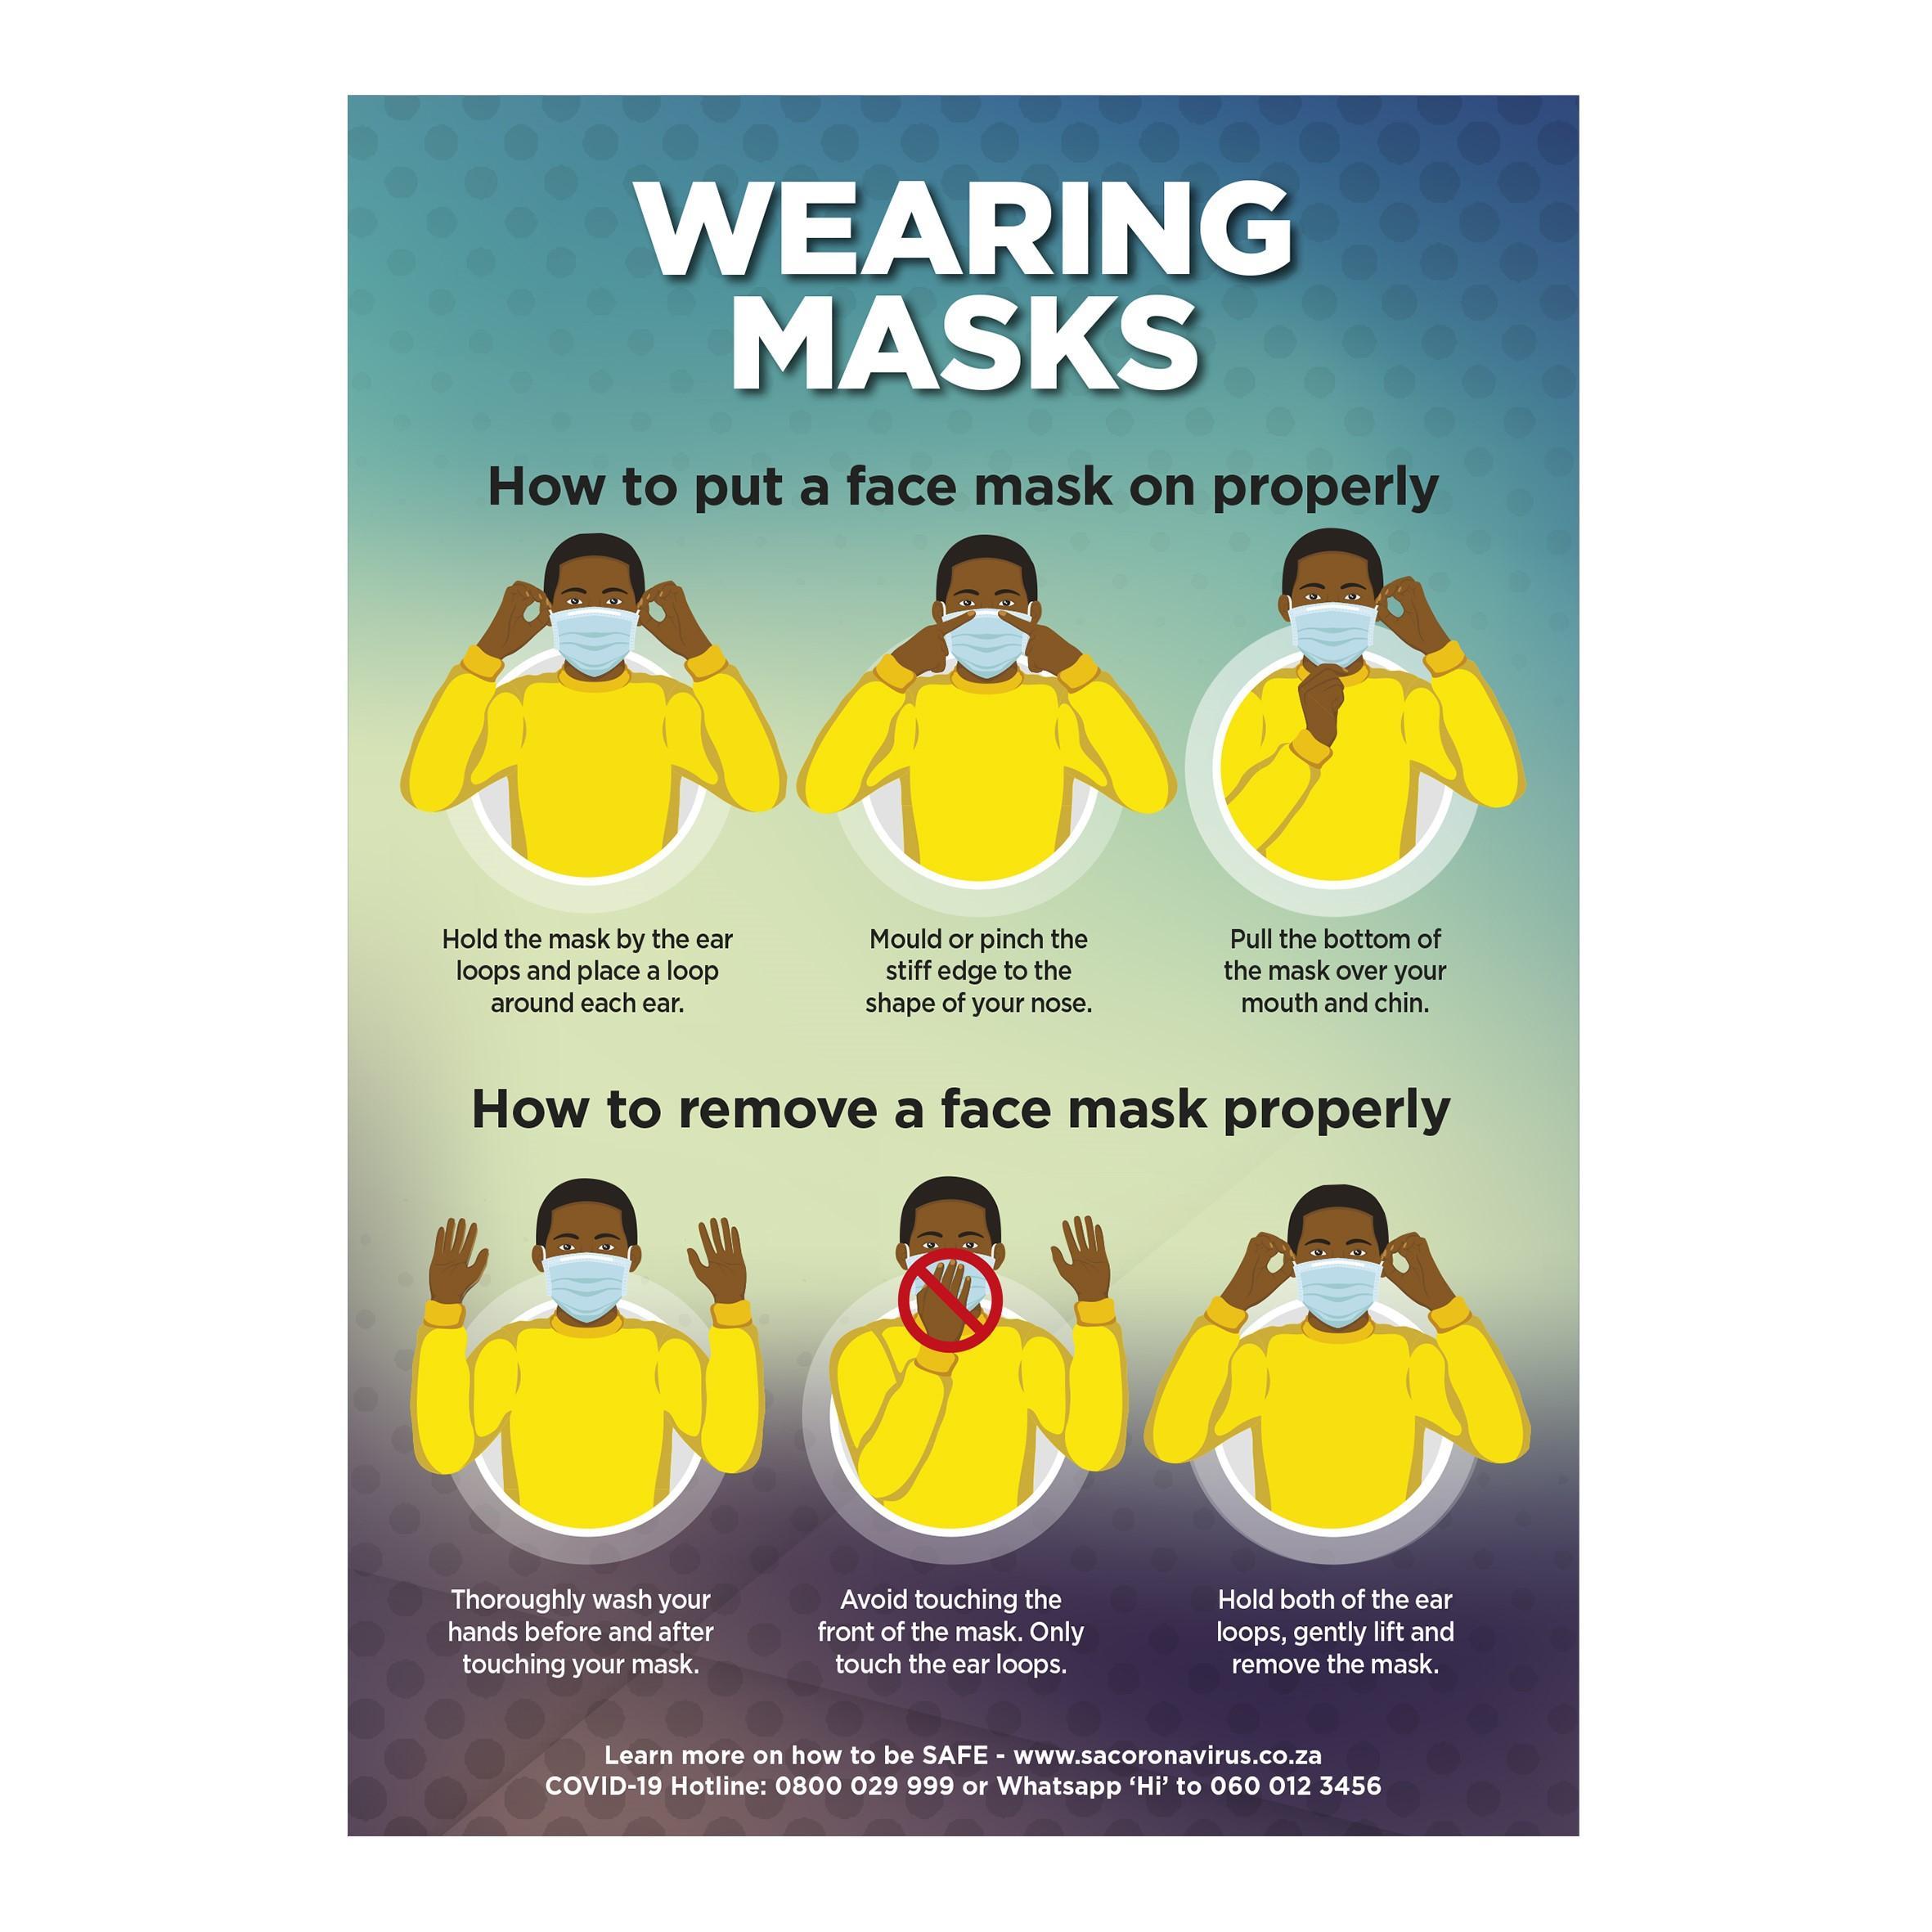 Saturn A0 Face Masks Poster - Per Unit